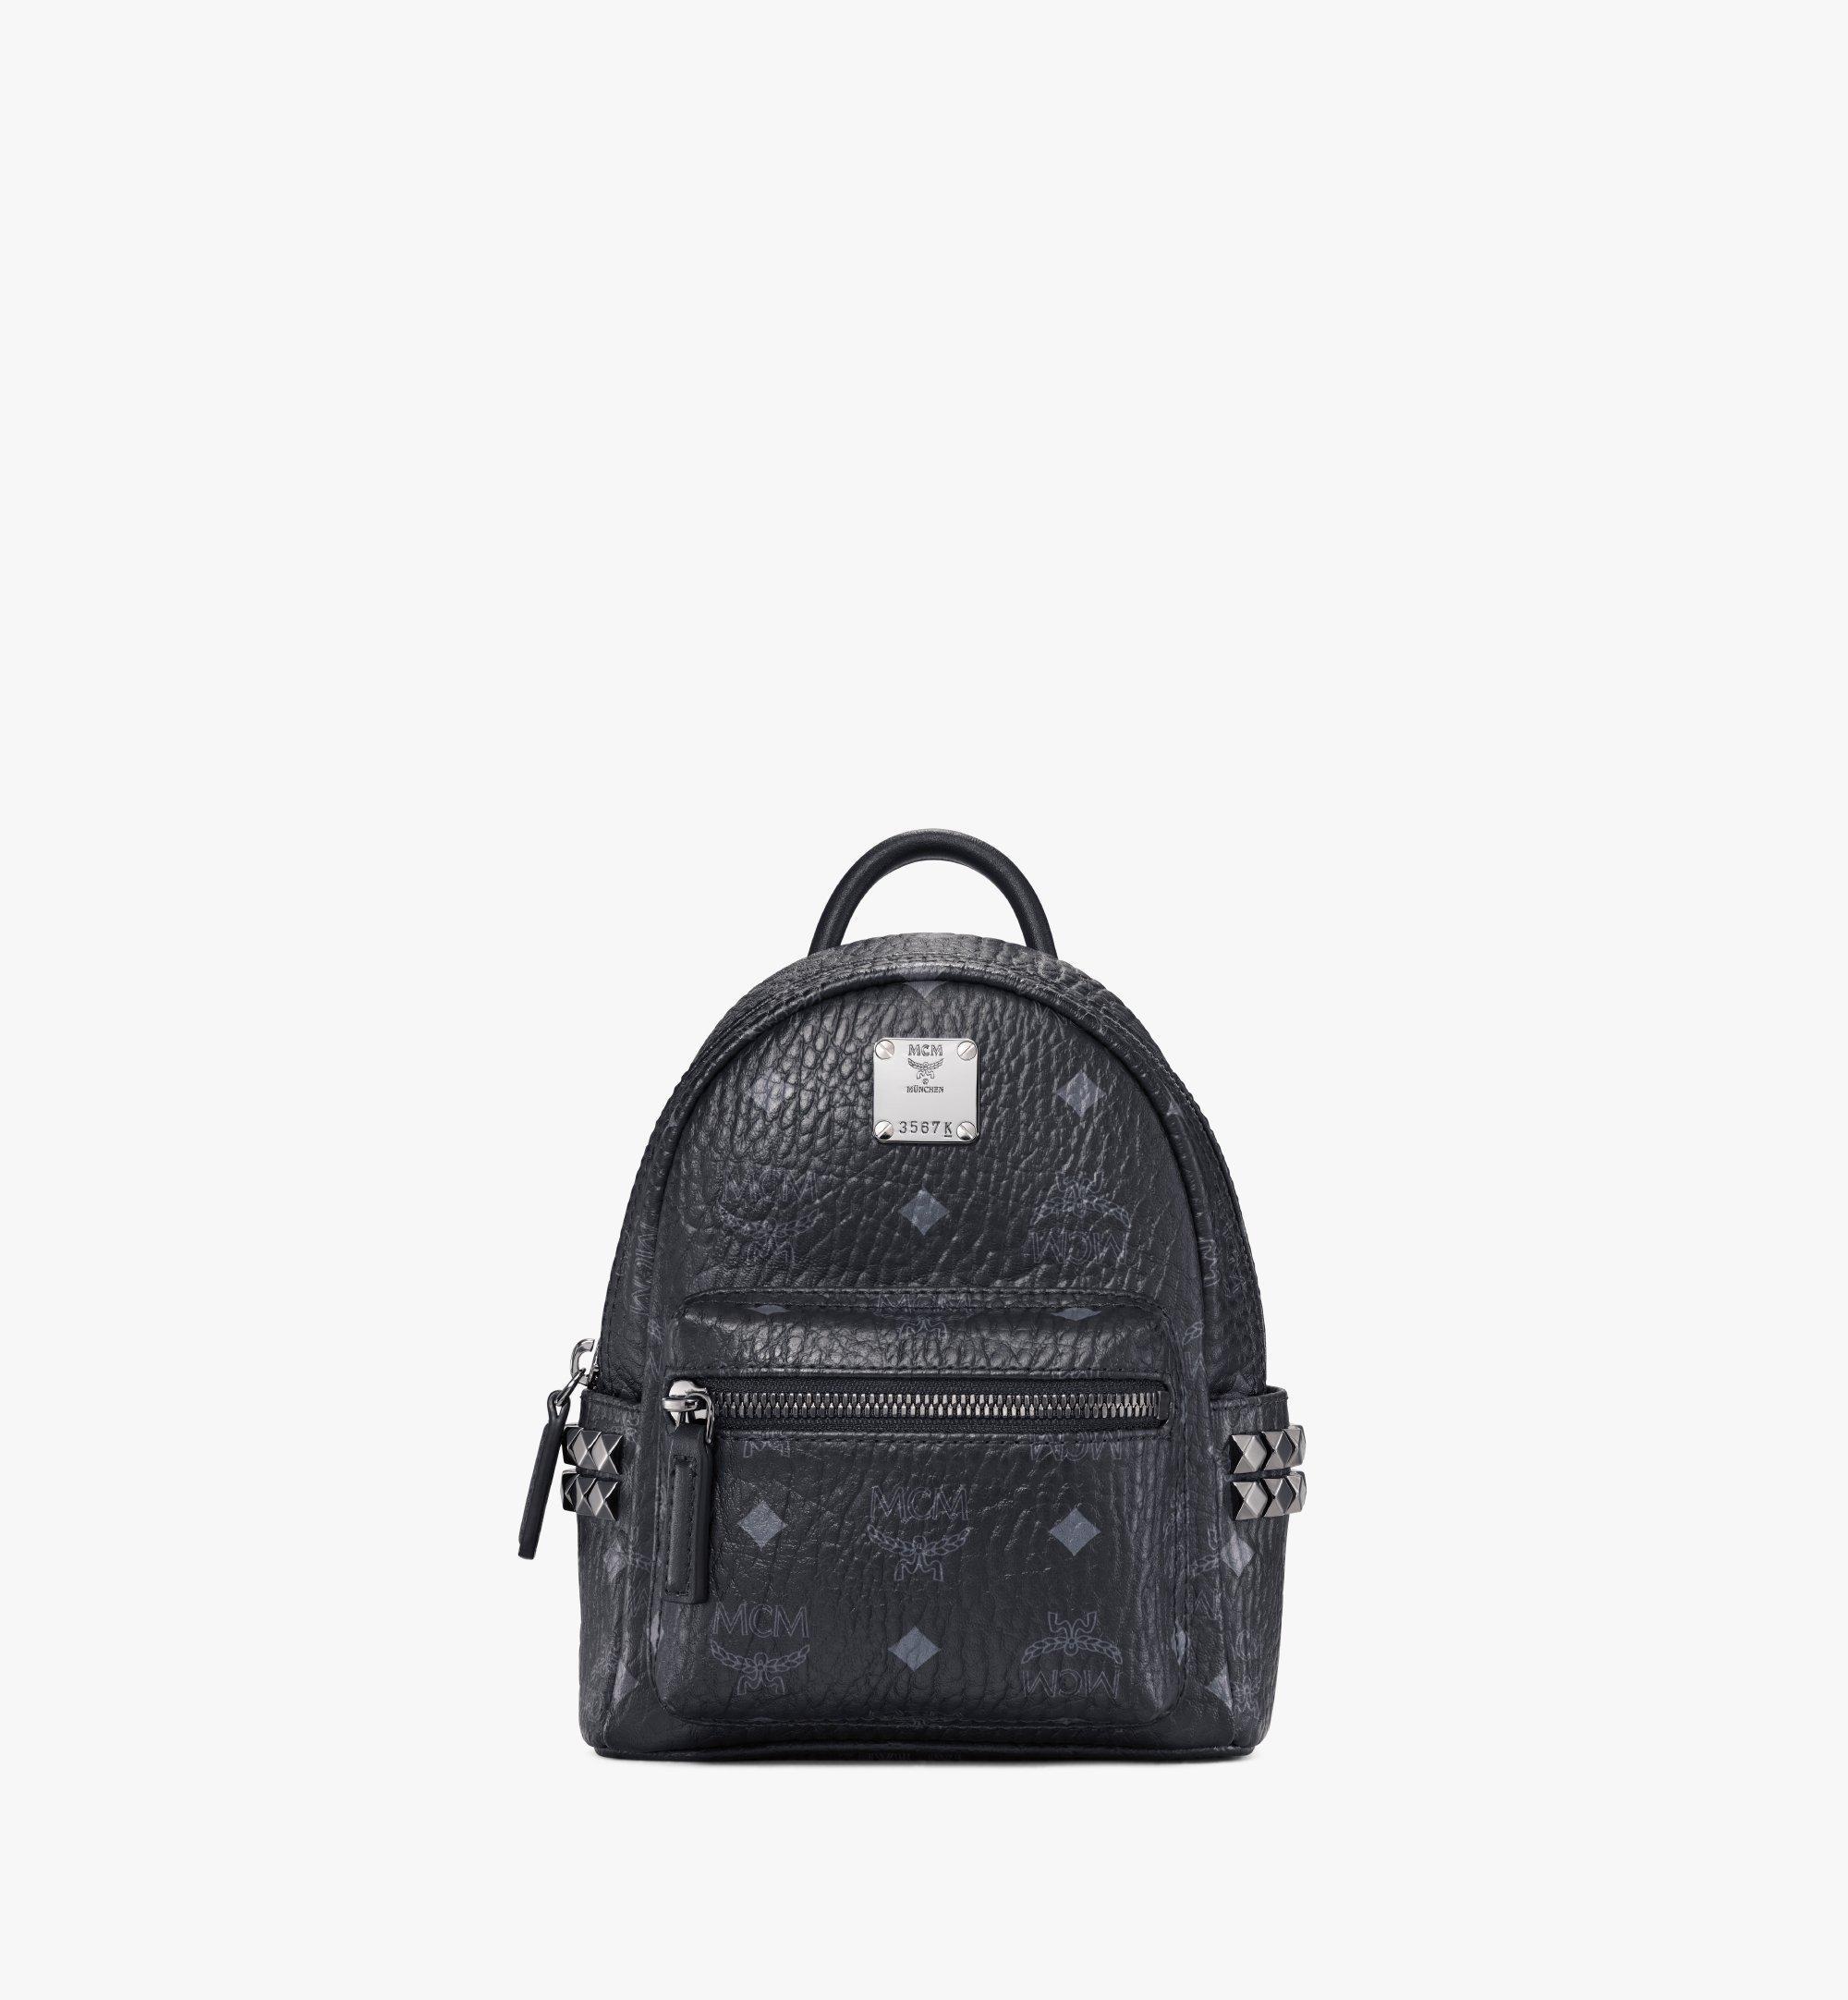 20 cm   8 in Stark Side Studs Bebe Boo Backpack in Visetos Black  05a388efb85e6